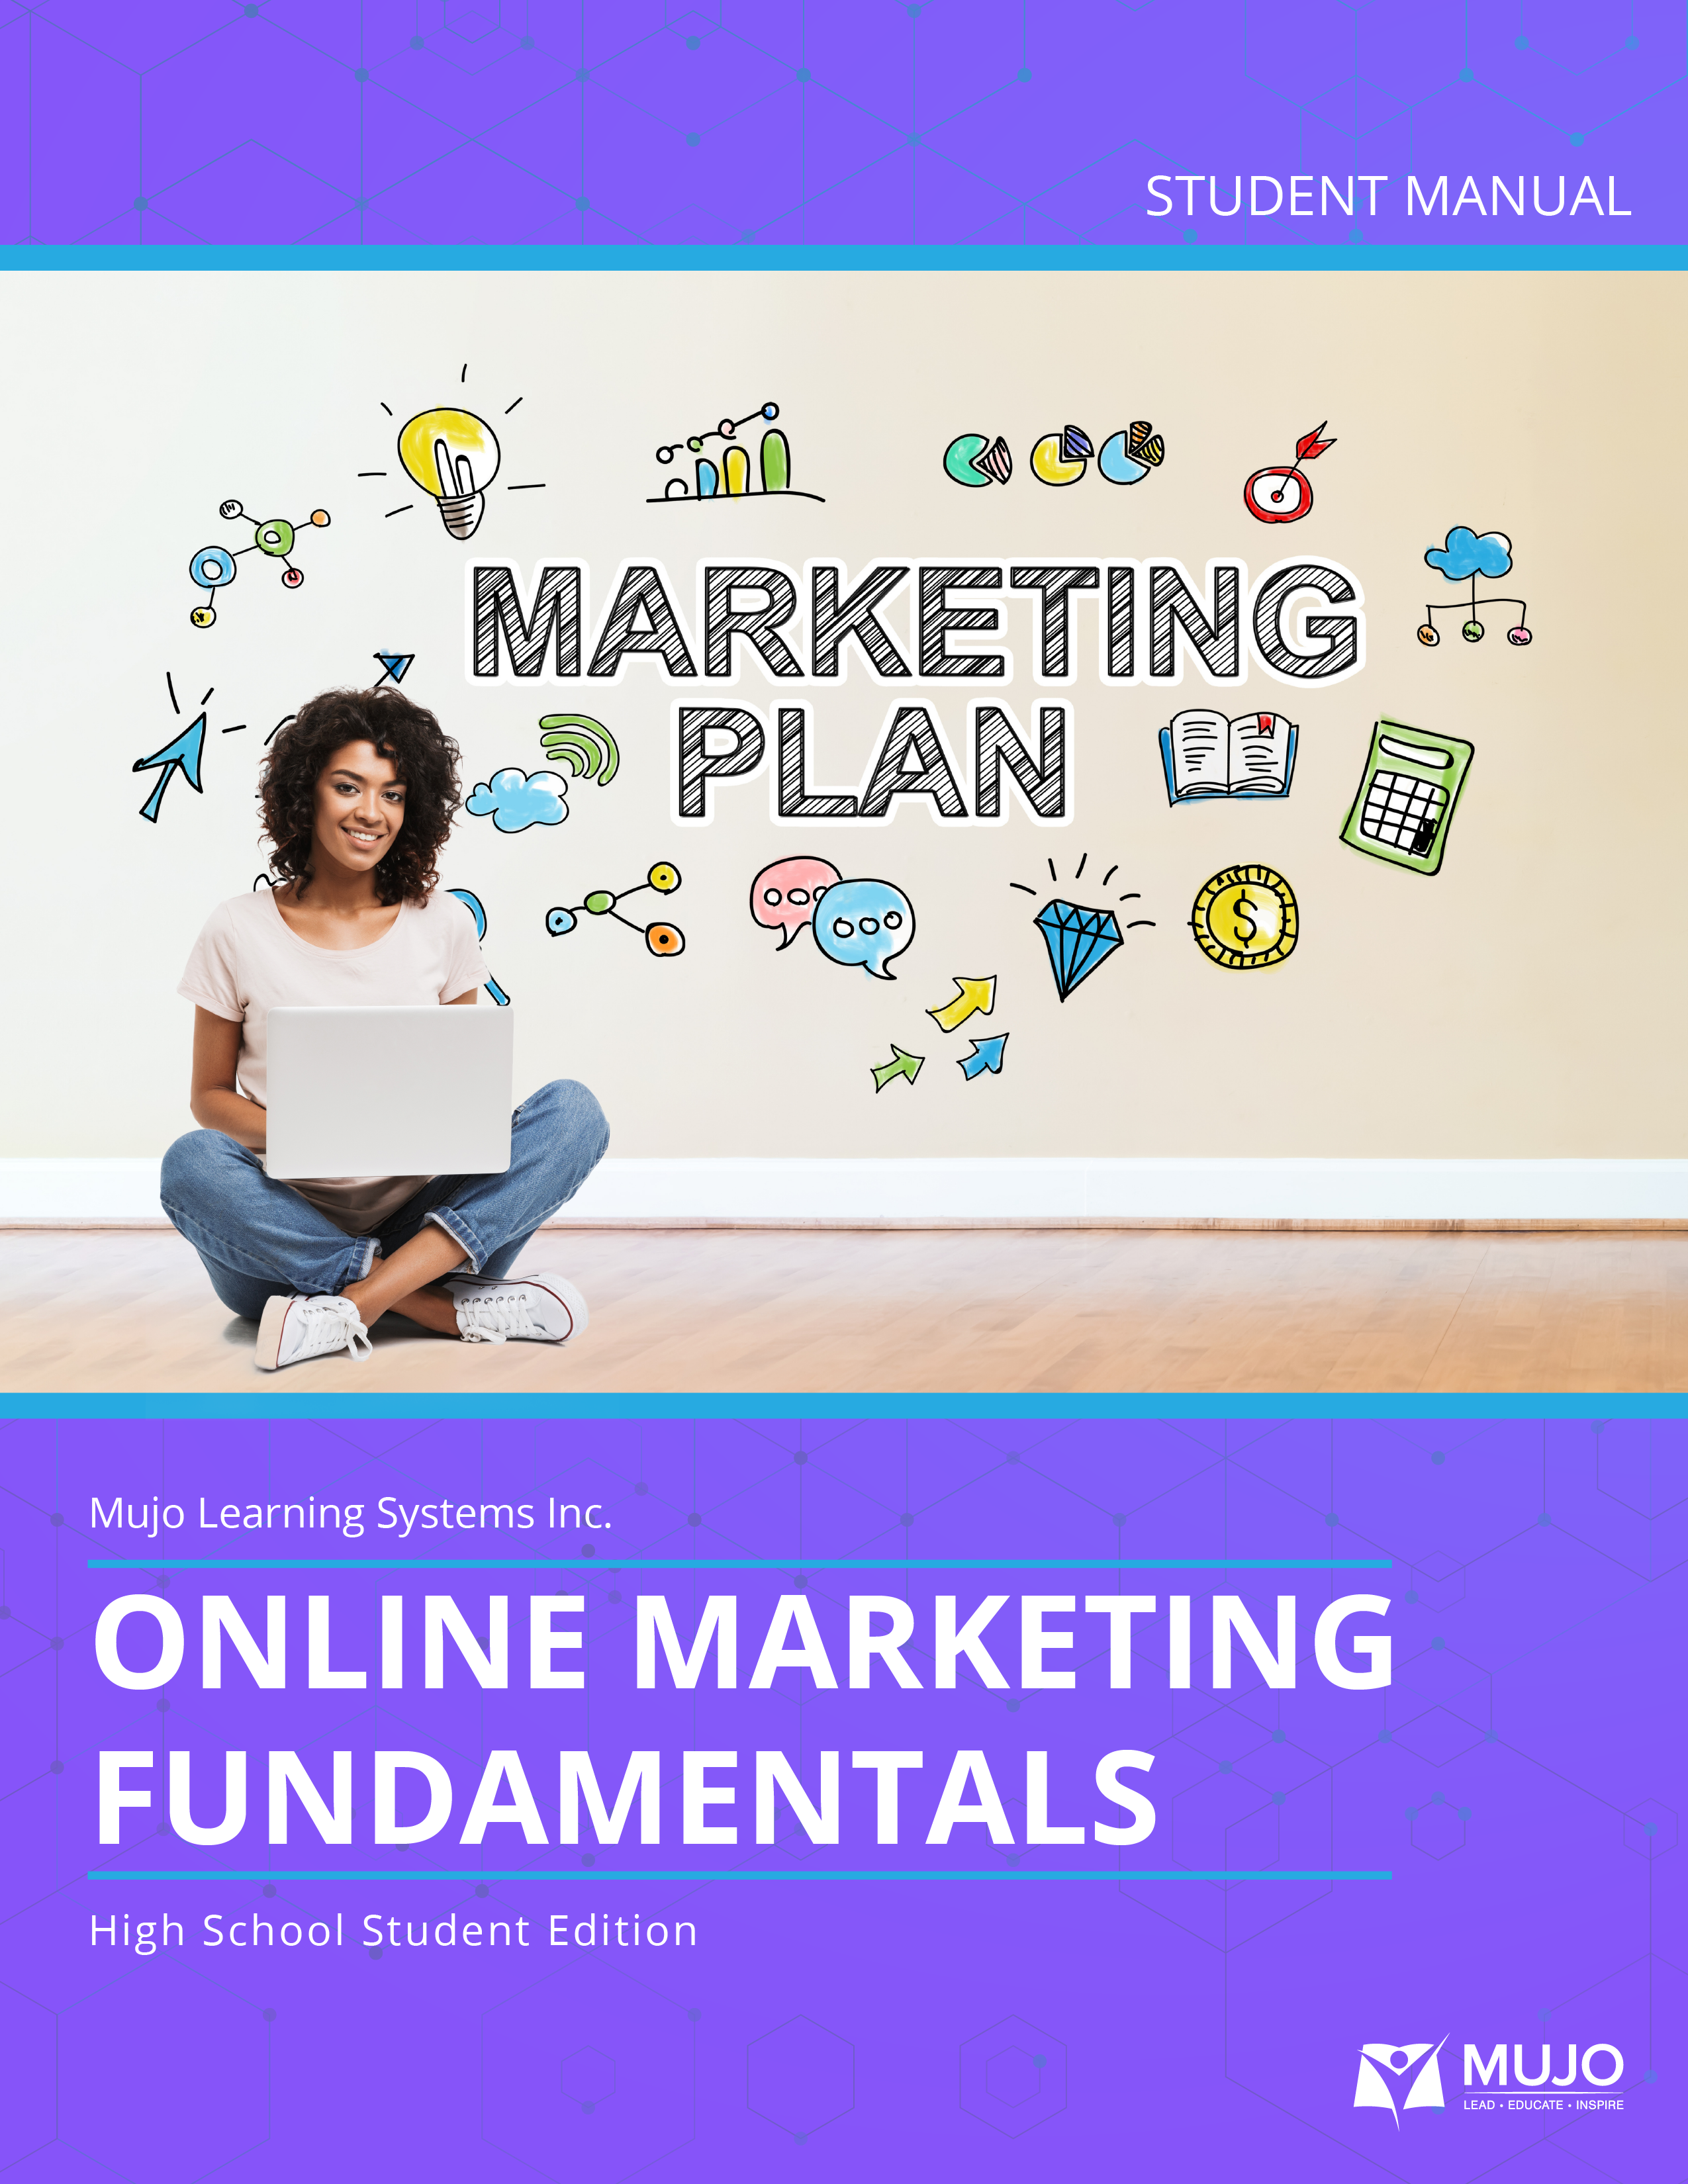 Online marketing fundamentals textbook